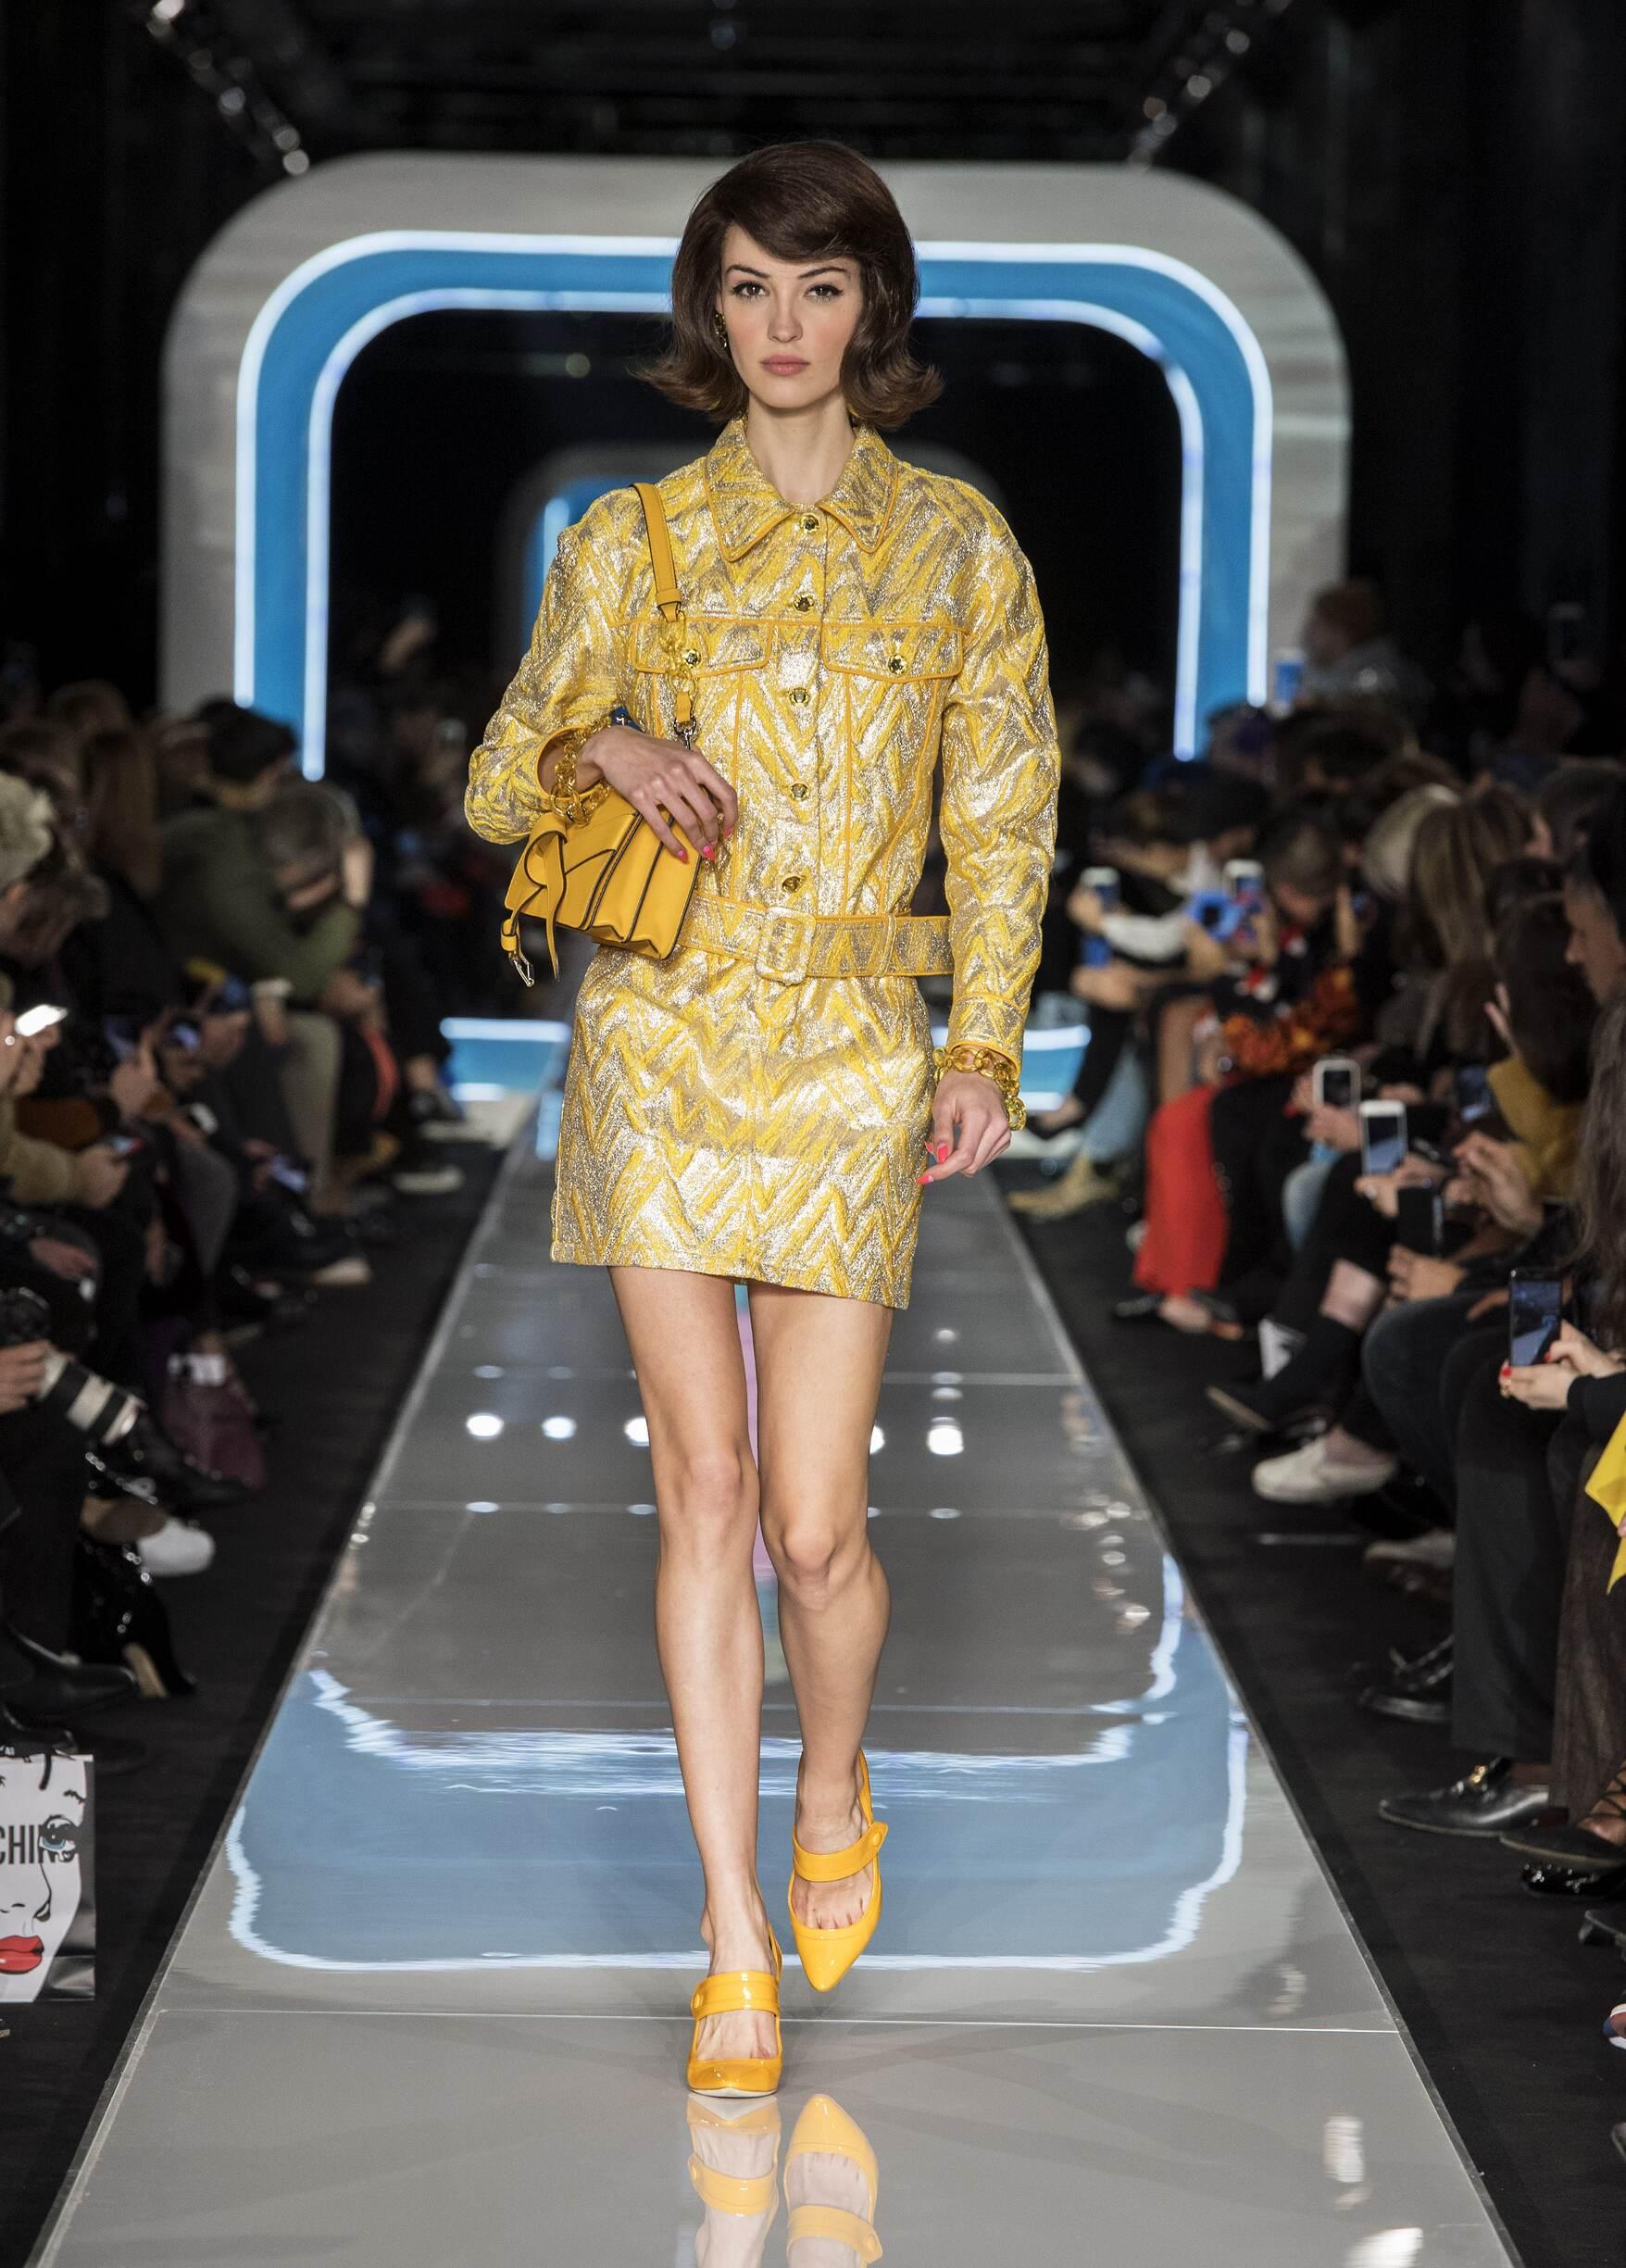 FW 2018-19 Moschino Fashion Show Milan